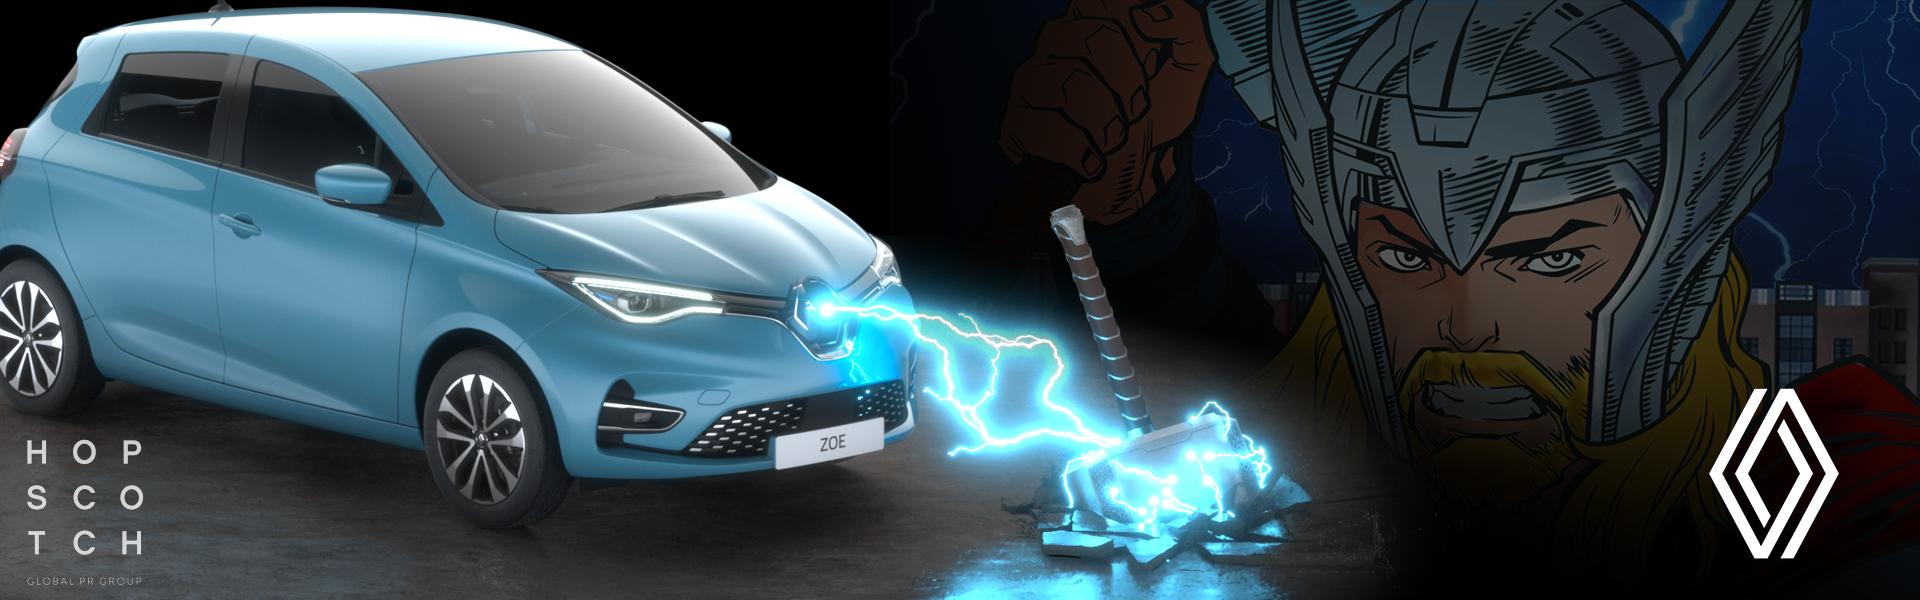 bandeau show holographique Renault Marvel